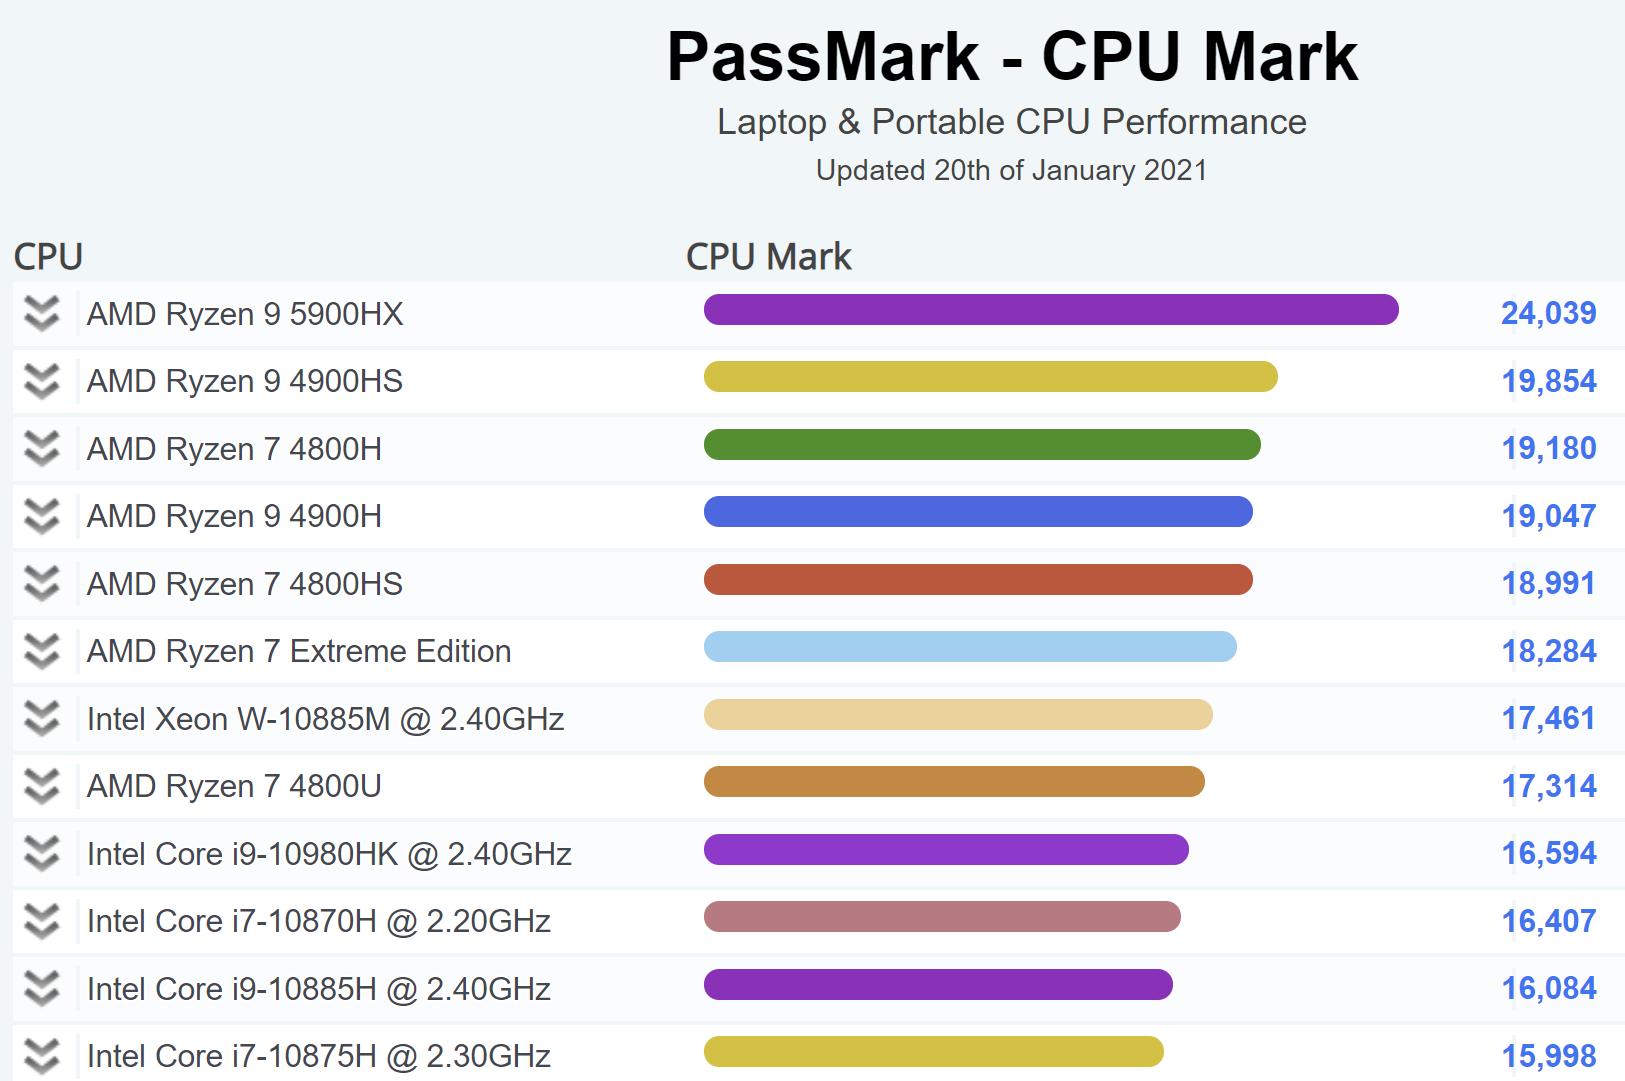 AMD Ryzen 9 5900HX en PassMark 0